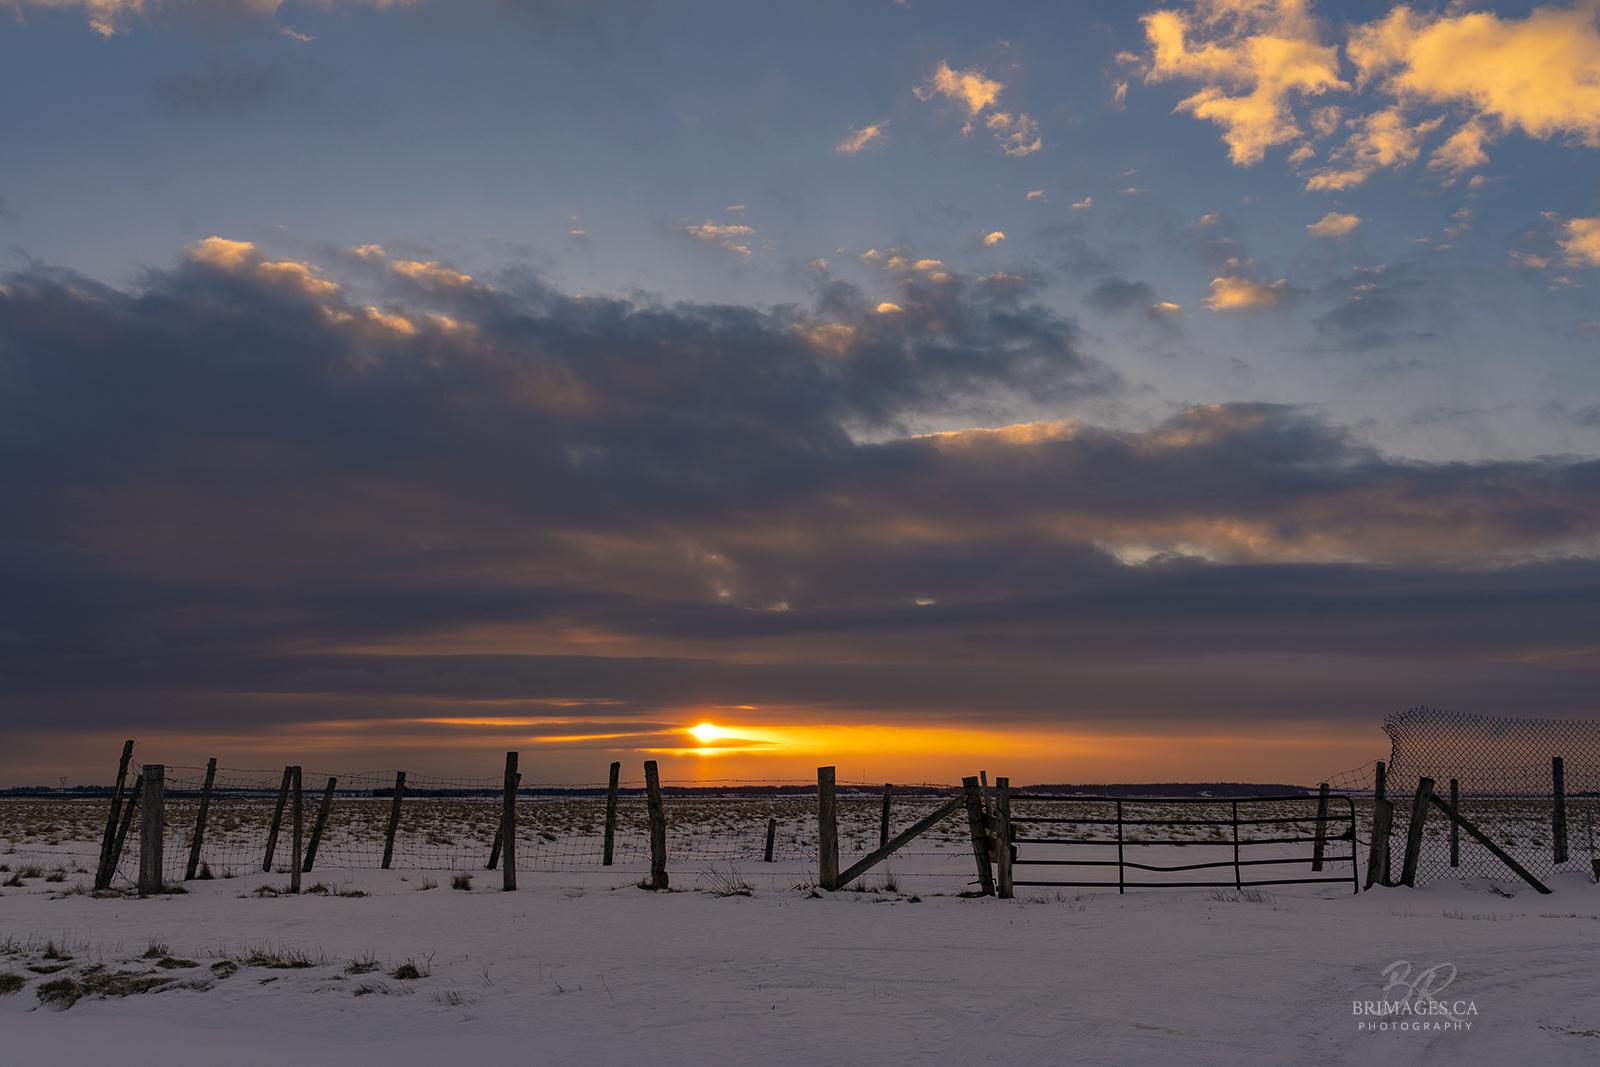 sunrise-new-brunswick-2-BRimages.ca